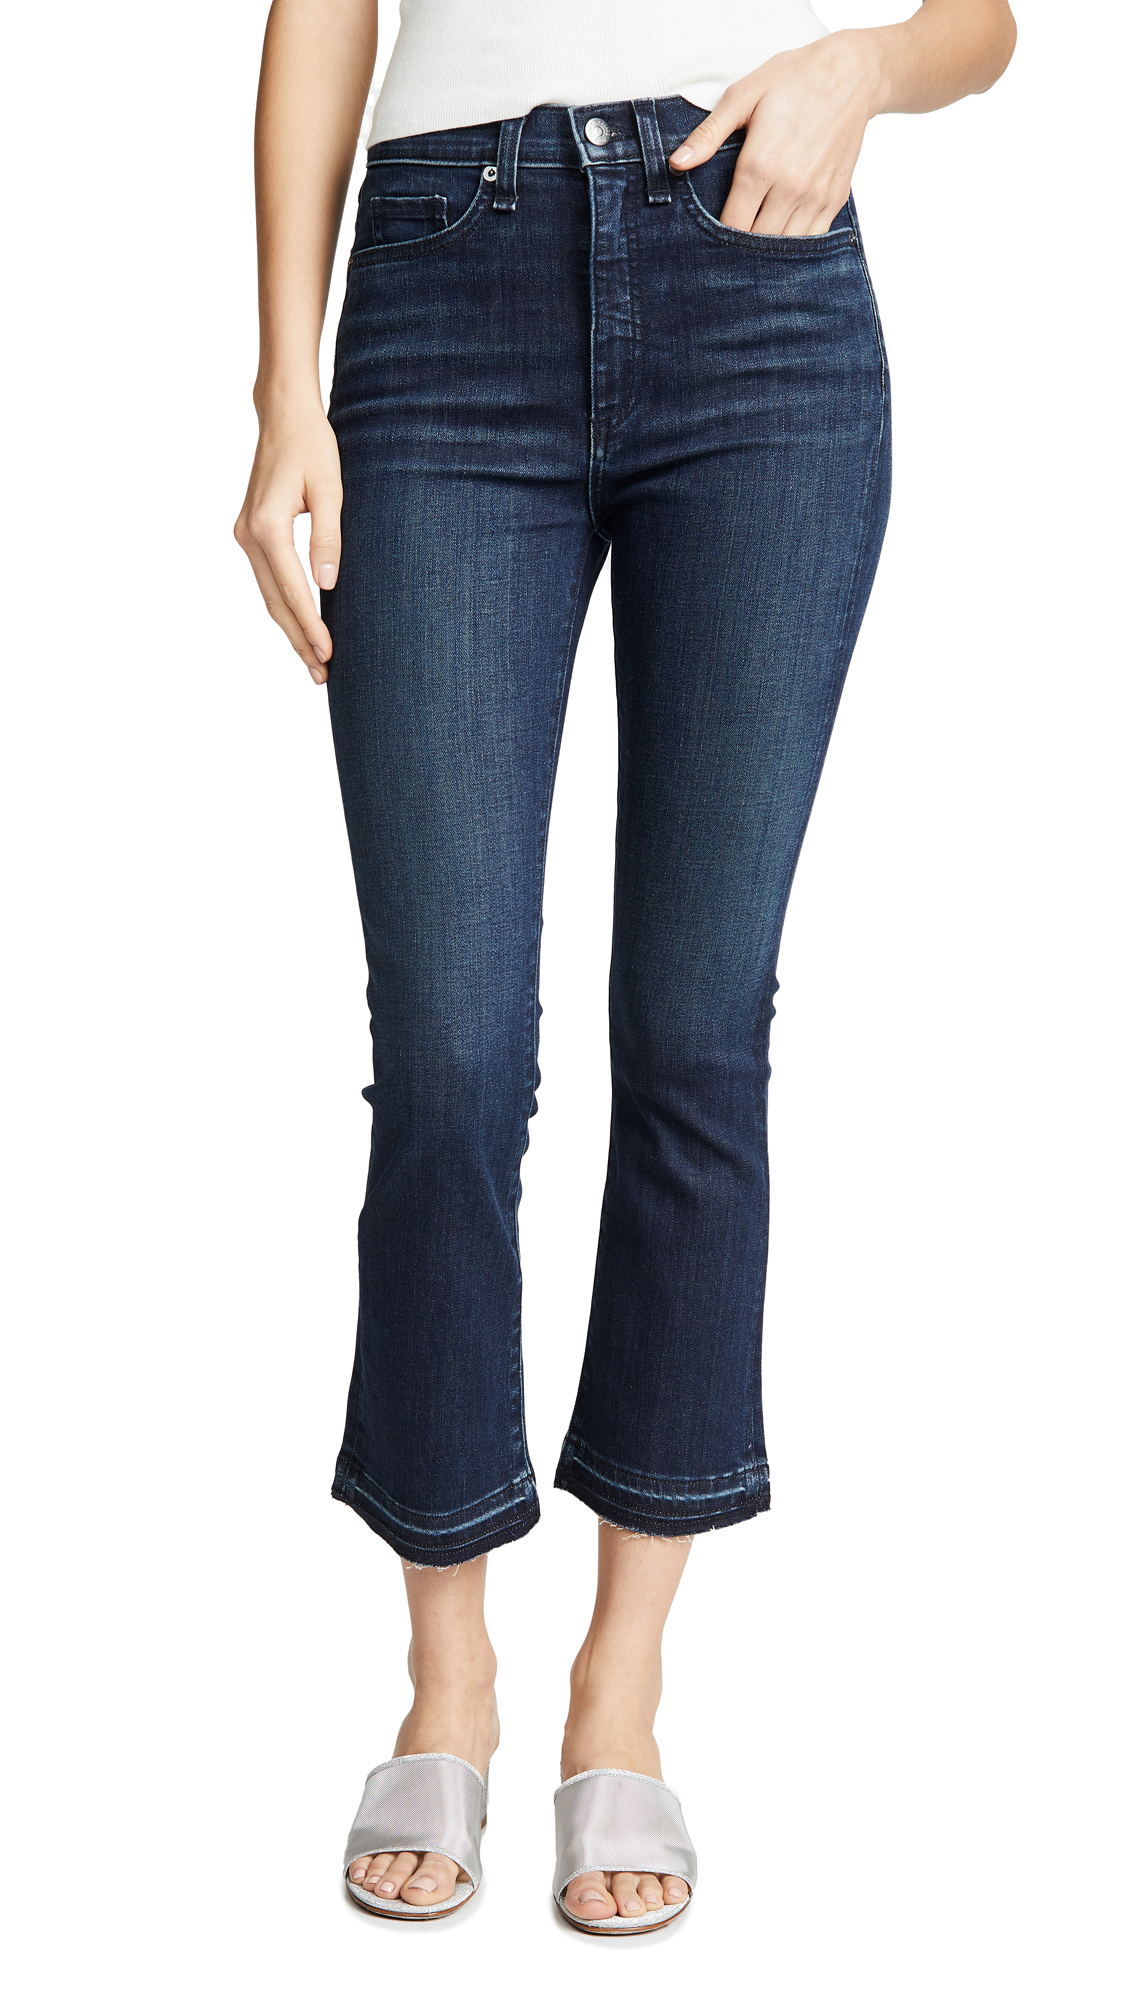 "VERONICA BEARD JEAN Carly 11 Kick Flare Jeans"" in Midnight"